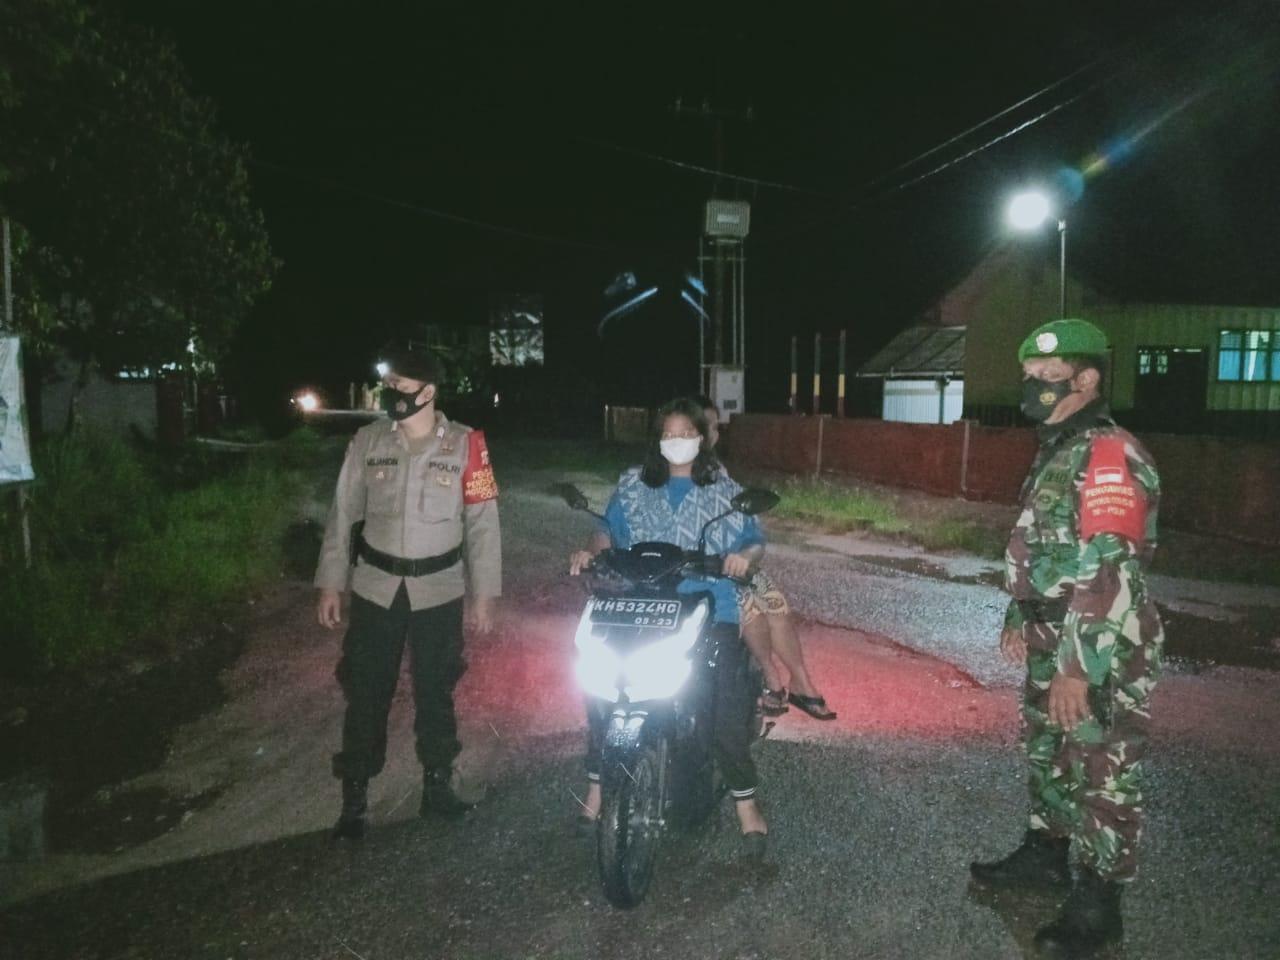 JAJARAN POLSEK TEWAH BERSINERGI BERSAMA TNI LAKSANAKAN OPERASI YUSTISI MALAM HARI 1